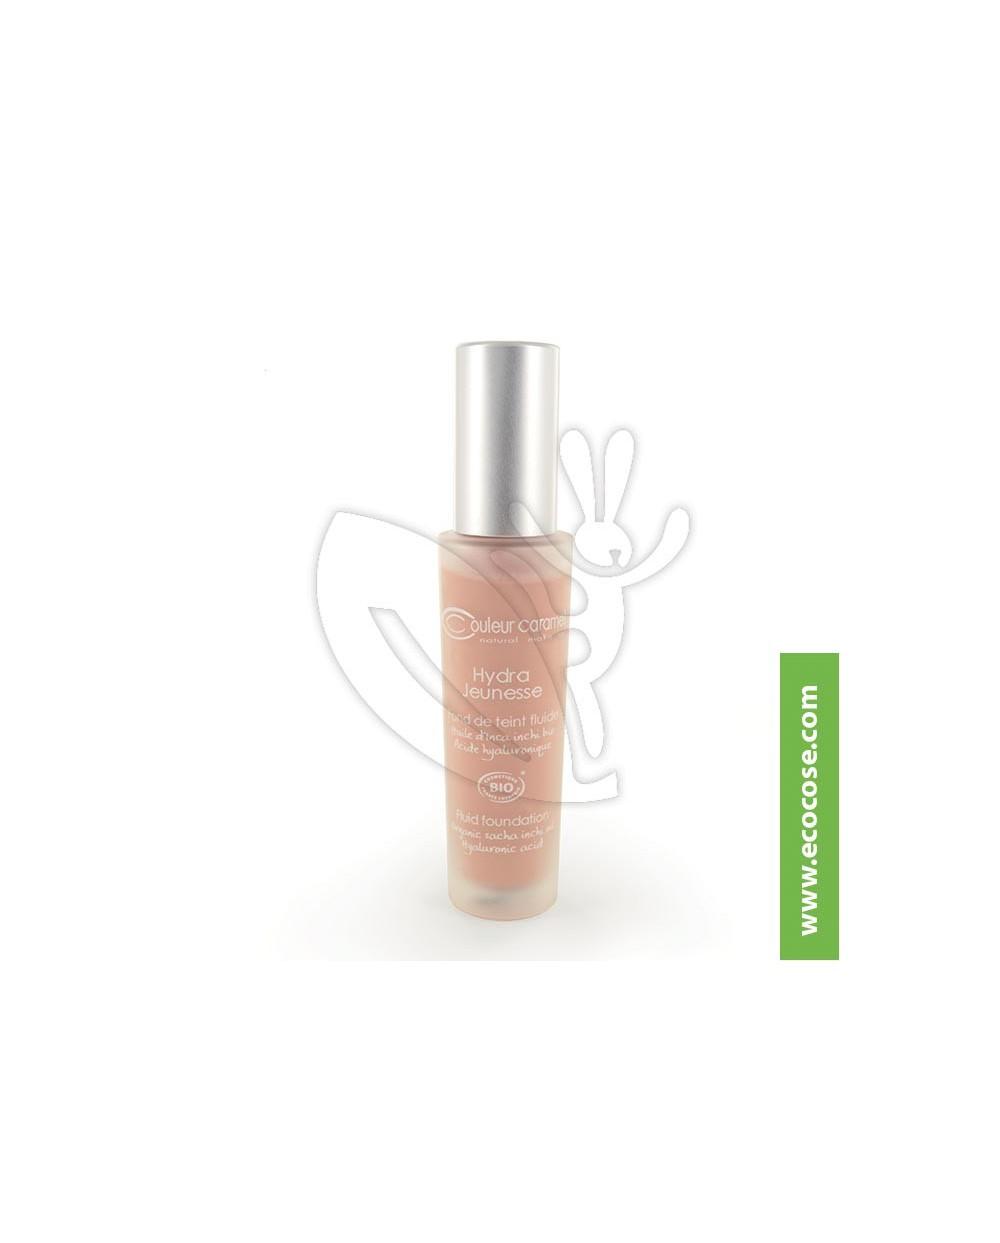 Couleur Caramel - Fondotinta Hydra Jeunesse - Beige ambré 26